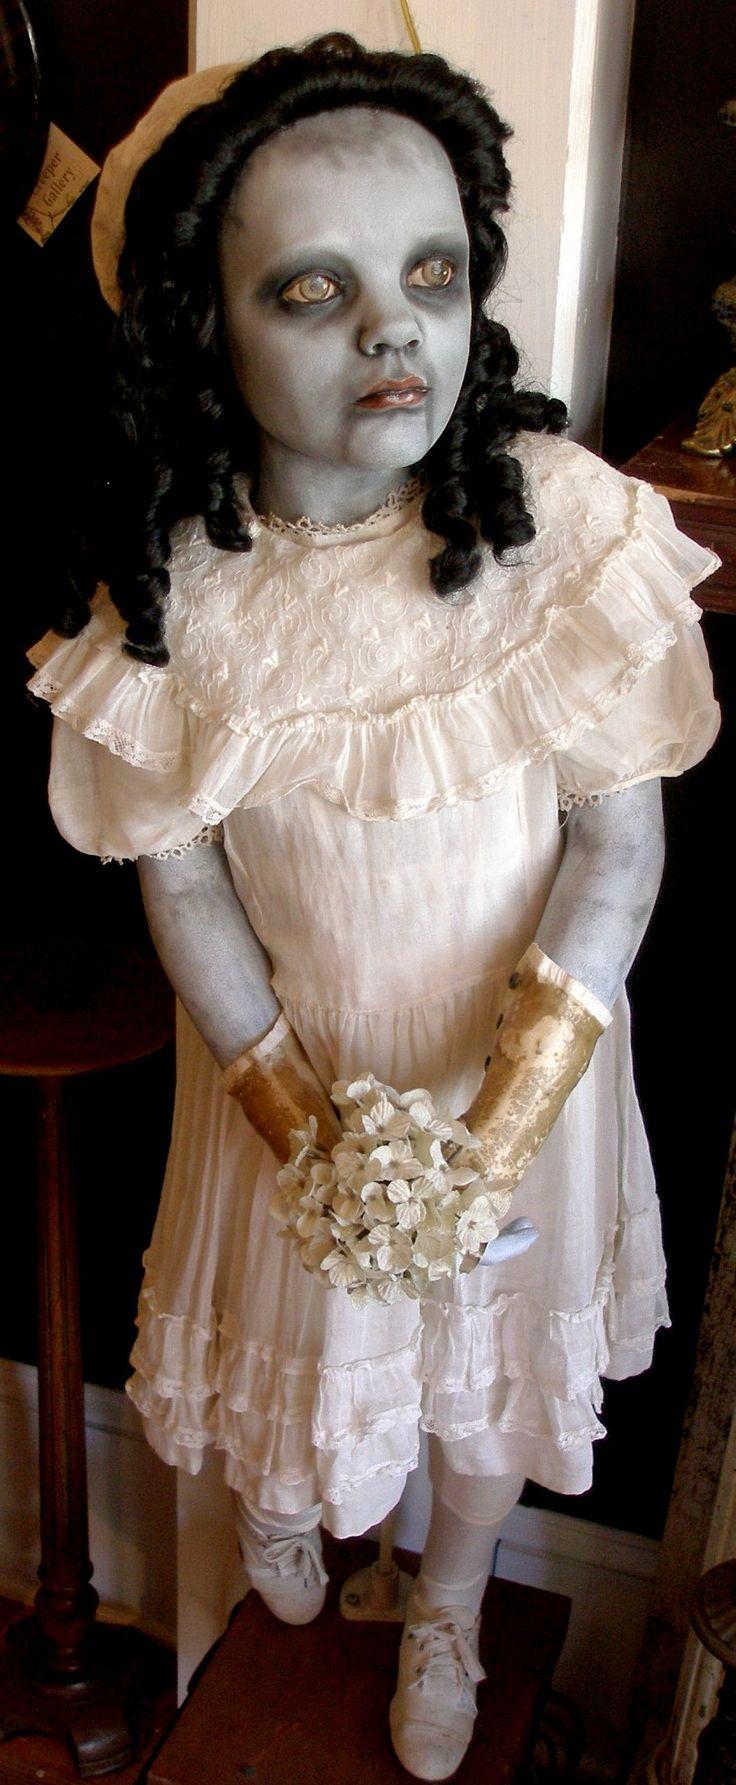 Christmas fancy dress ideas diy - Annabel Lee More